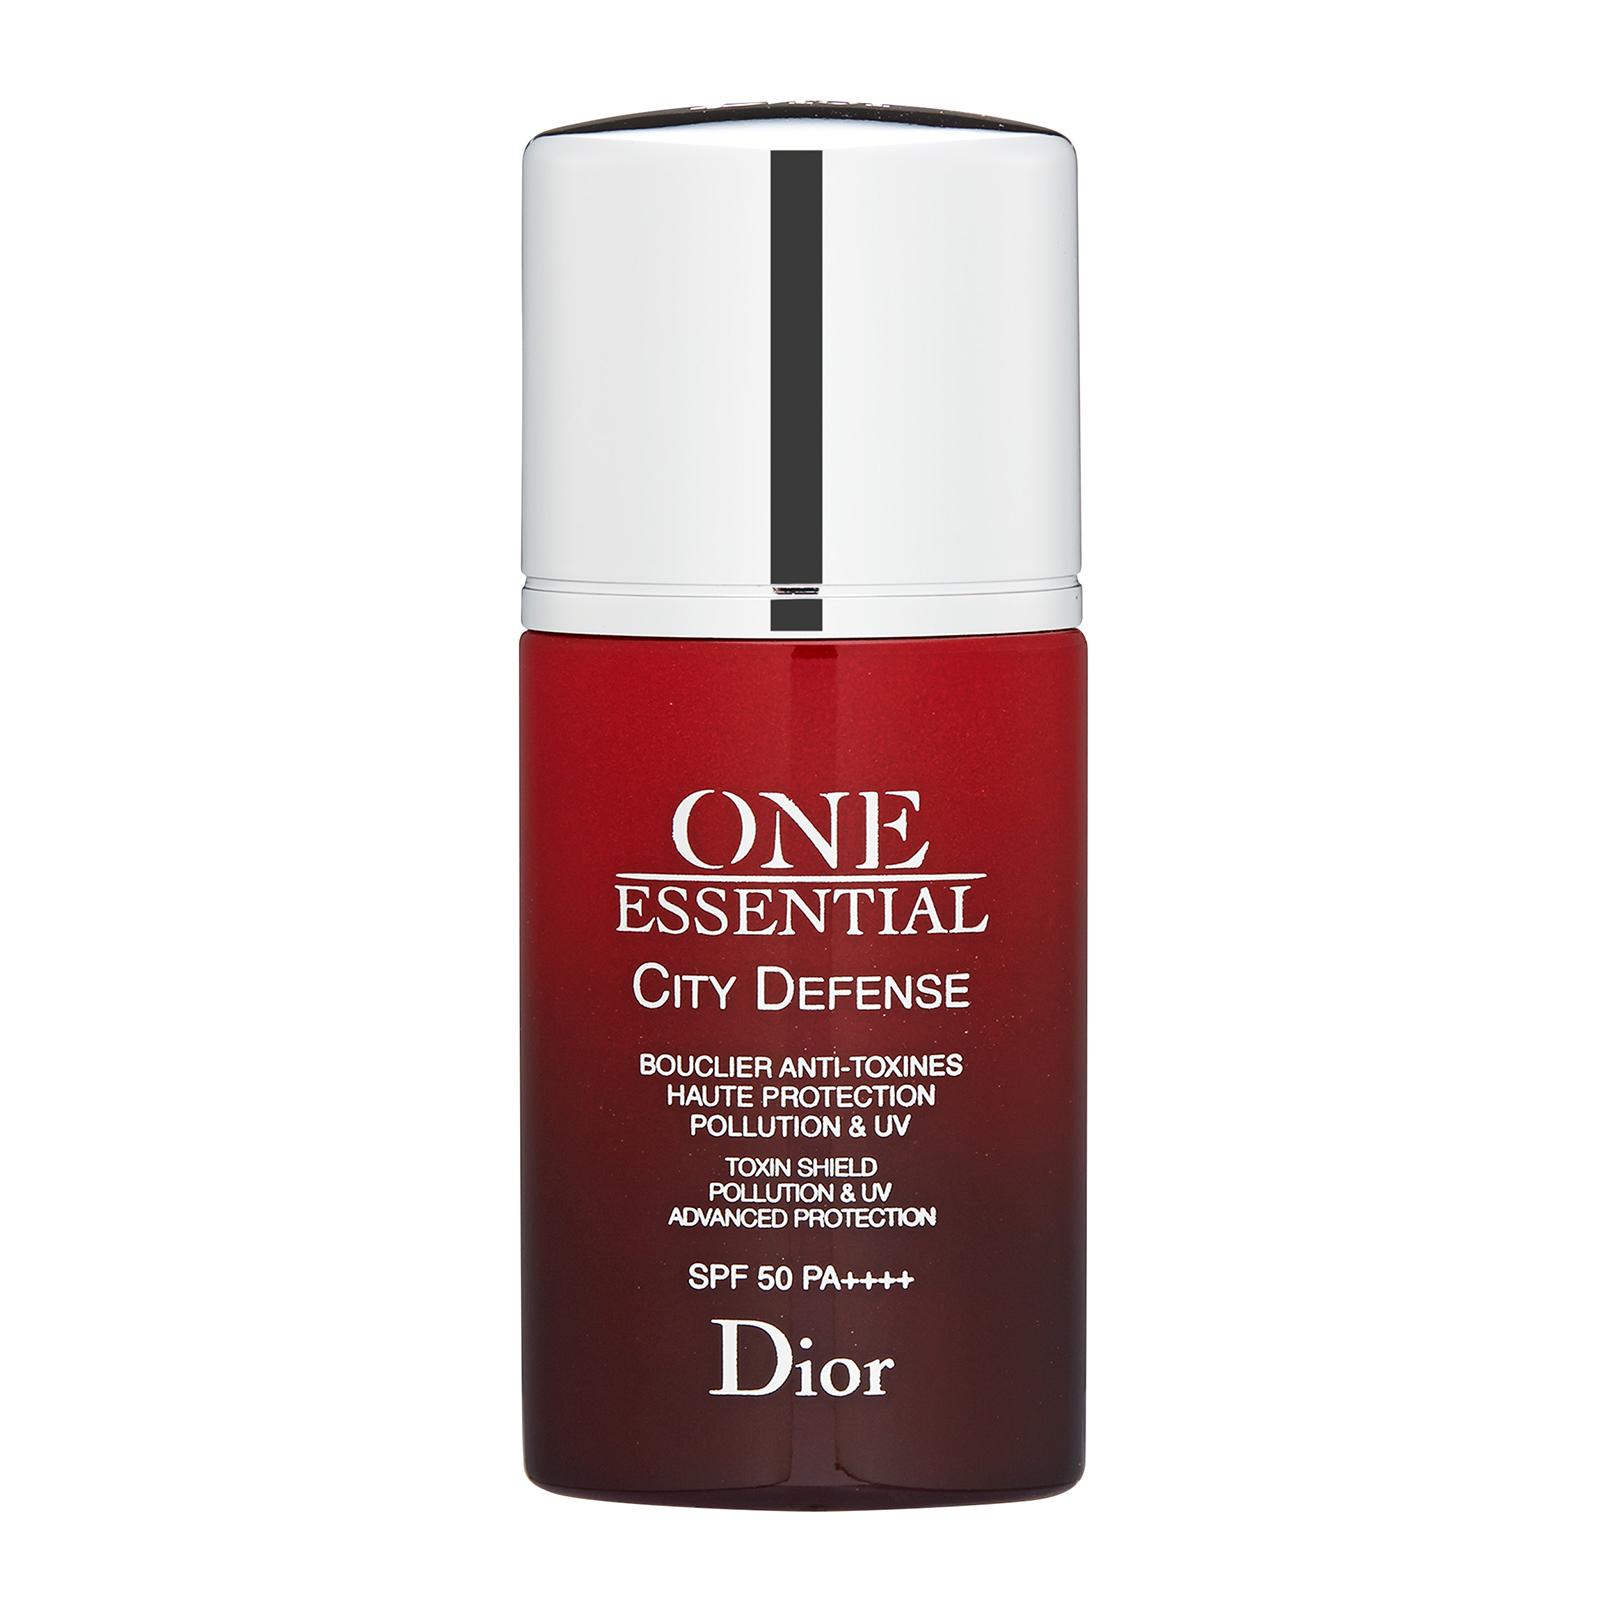 Защитный экран-cыворотка One Essential City Defense SPF50 PA++++, Dior